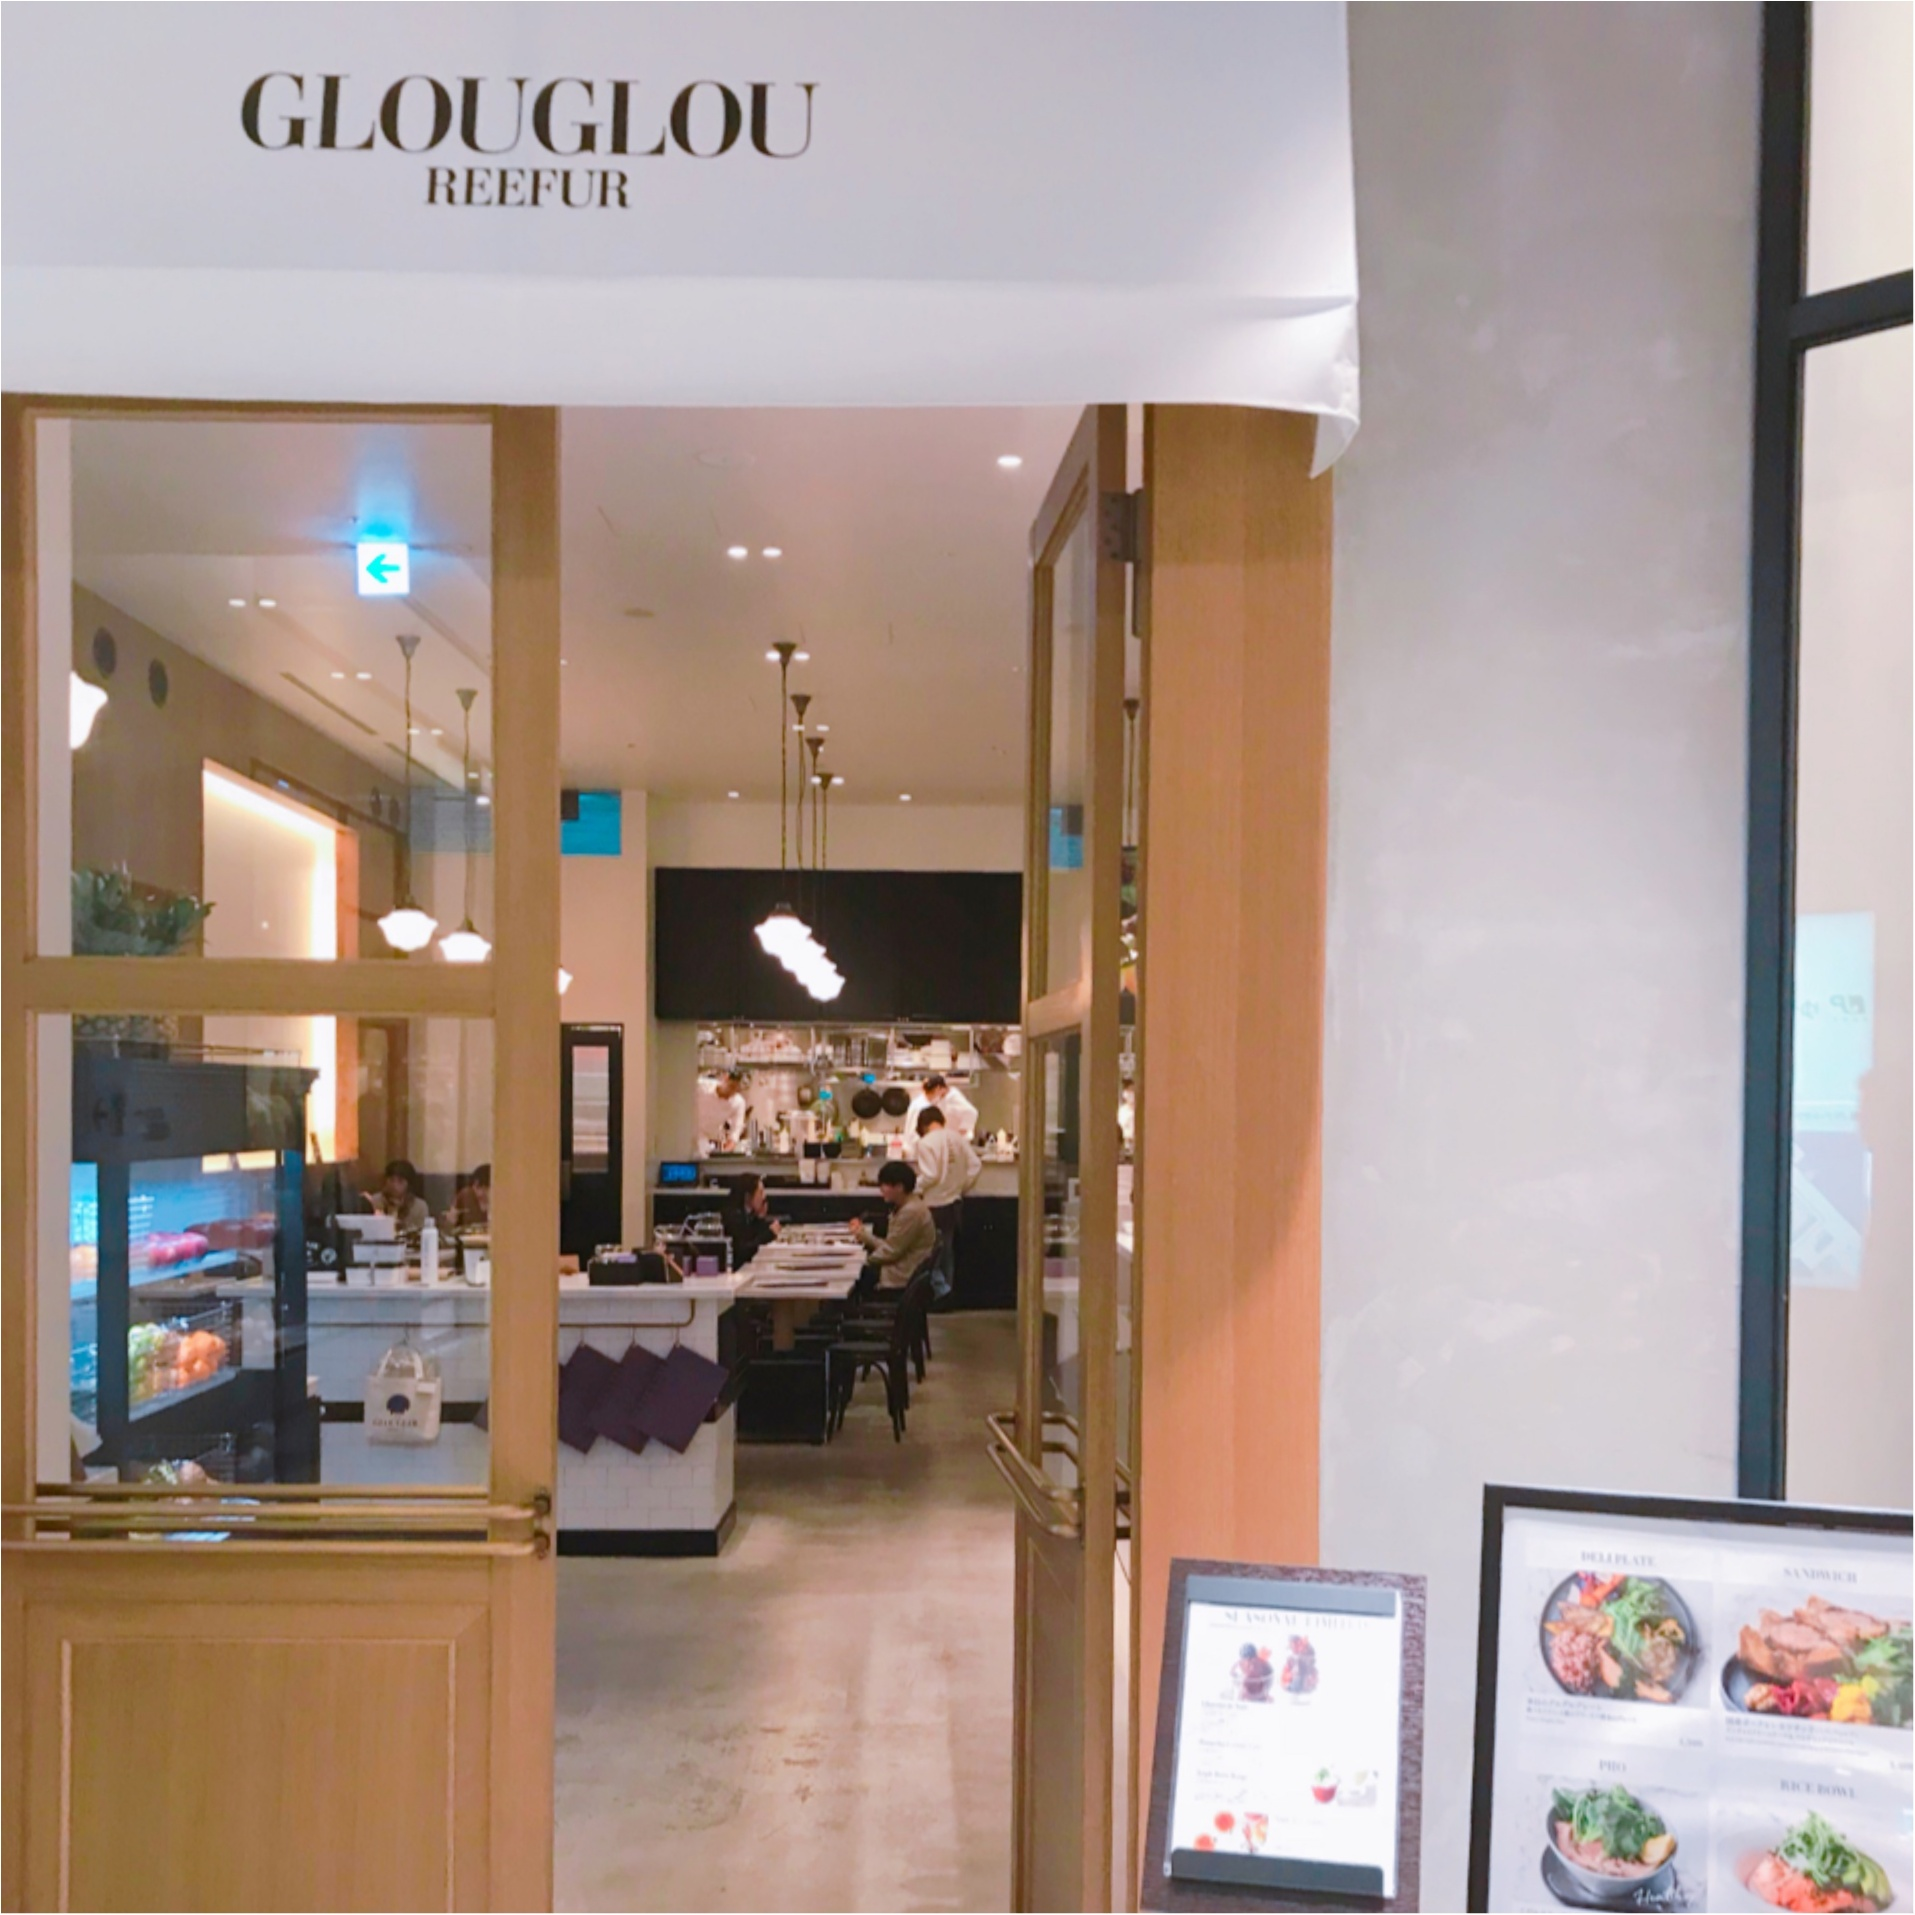 ★MAISON DE REEFURのカフェが名古屋にも上陸!私もようやく『GLOUGLOU REEFUR』へ行ってきました★_1